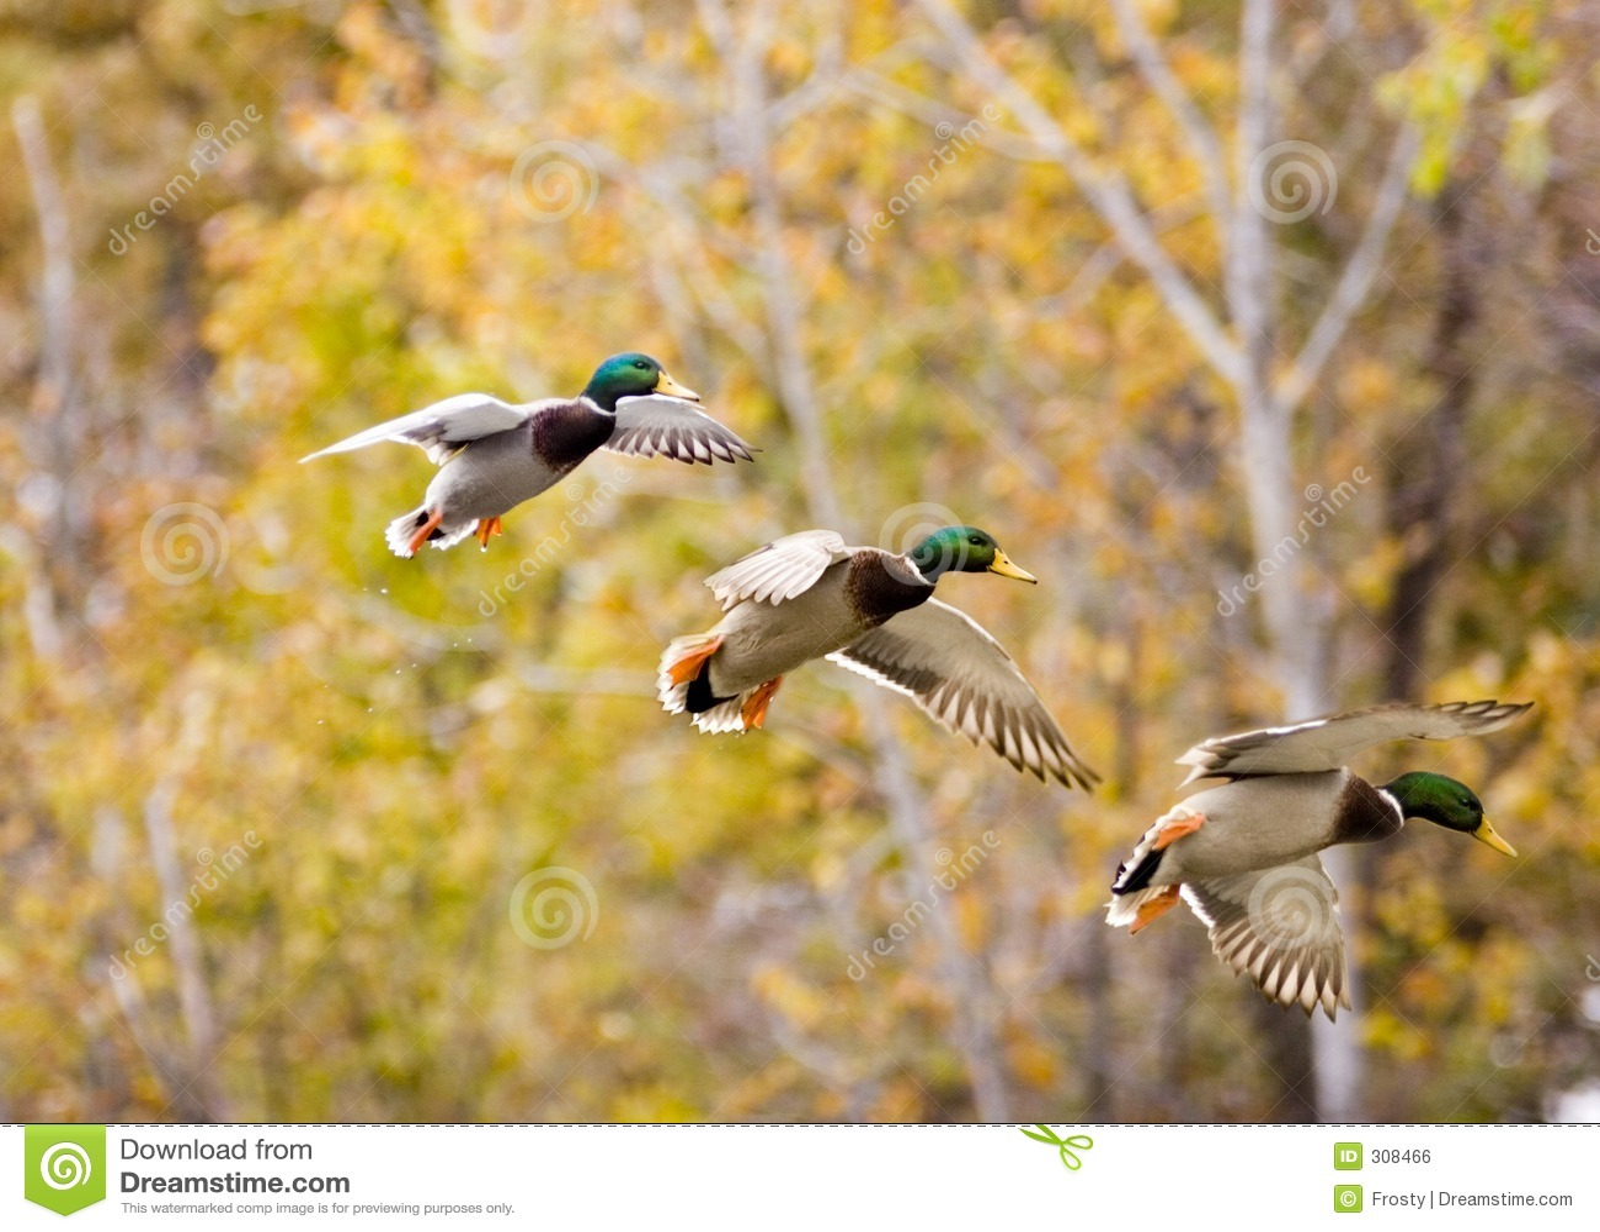 Fall Hunting Wallpaper Mallard In Sequence Stock Photo Image Of Bird Wild